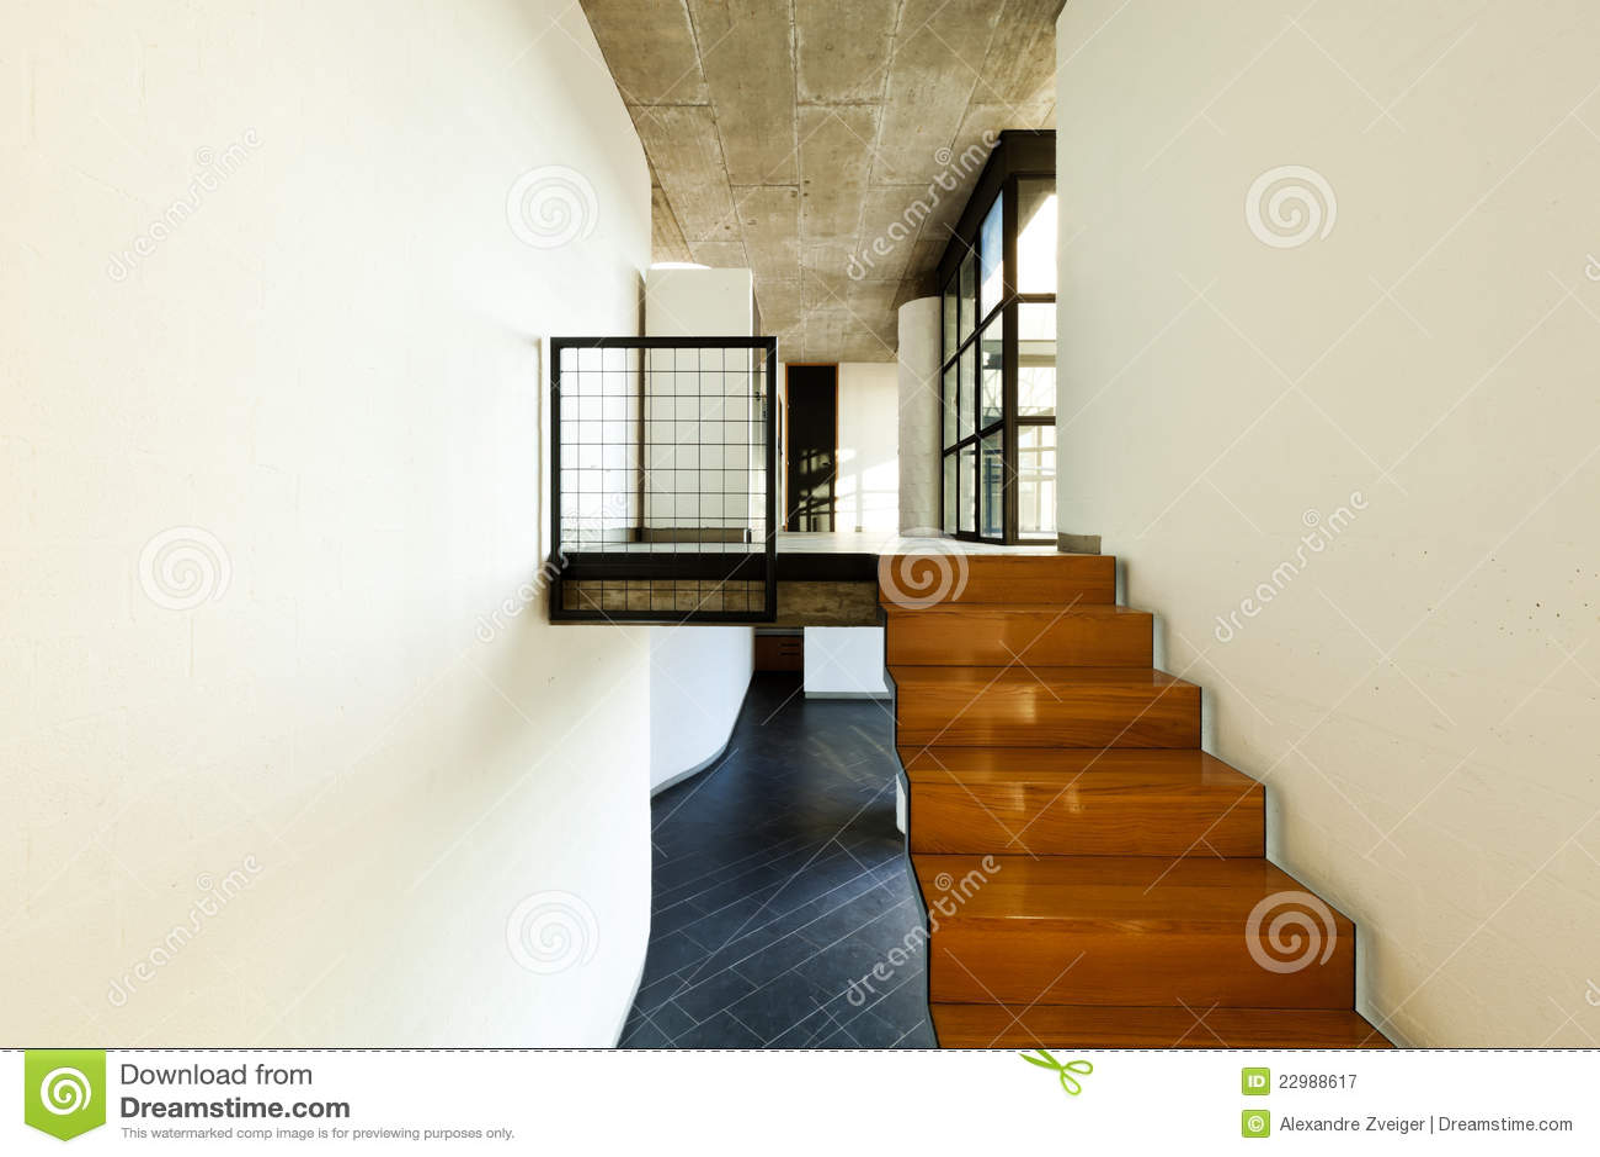 Casa interior escalera de madera fotograf a de archivo - Escaleras modernas de interior ...